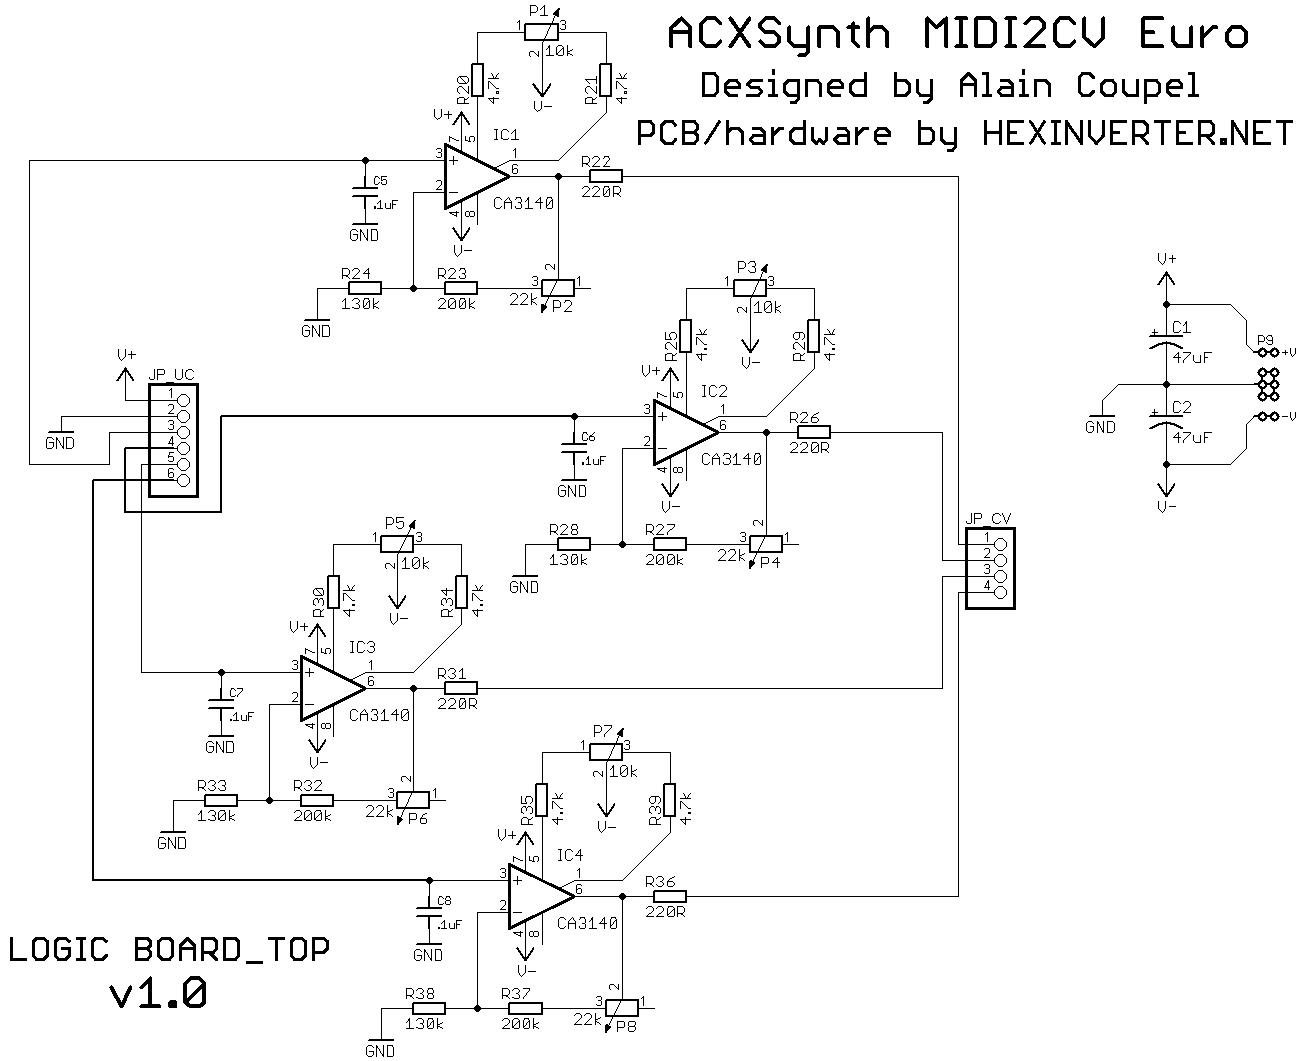 MIDI2CV_euro_schem_logic_TOP_v1.png